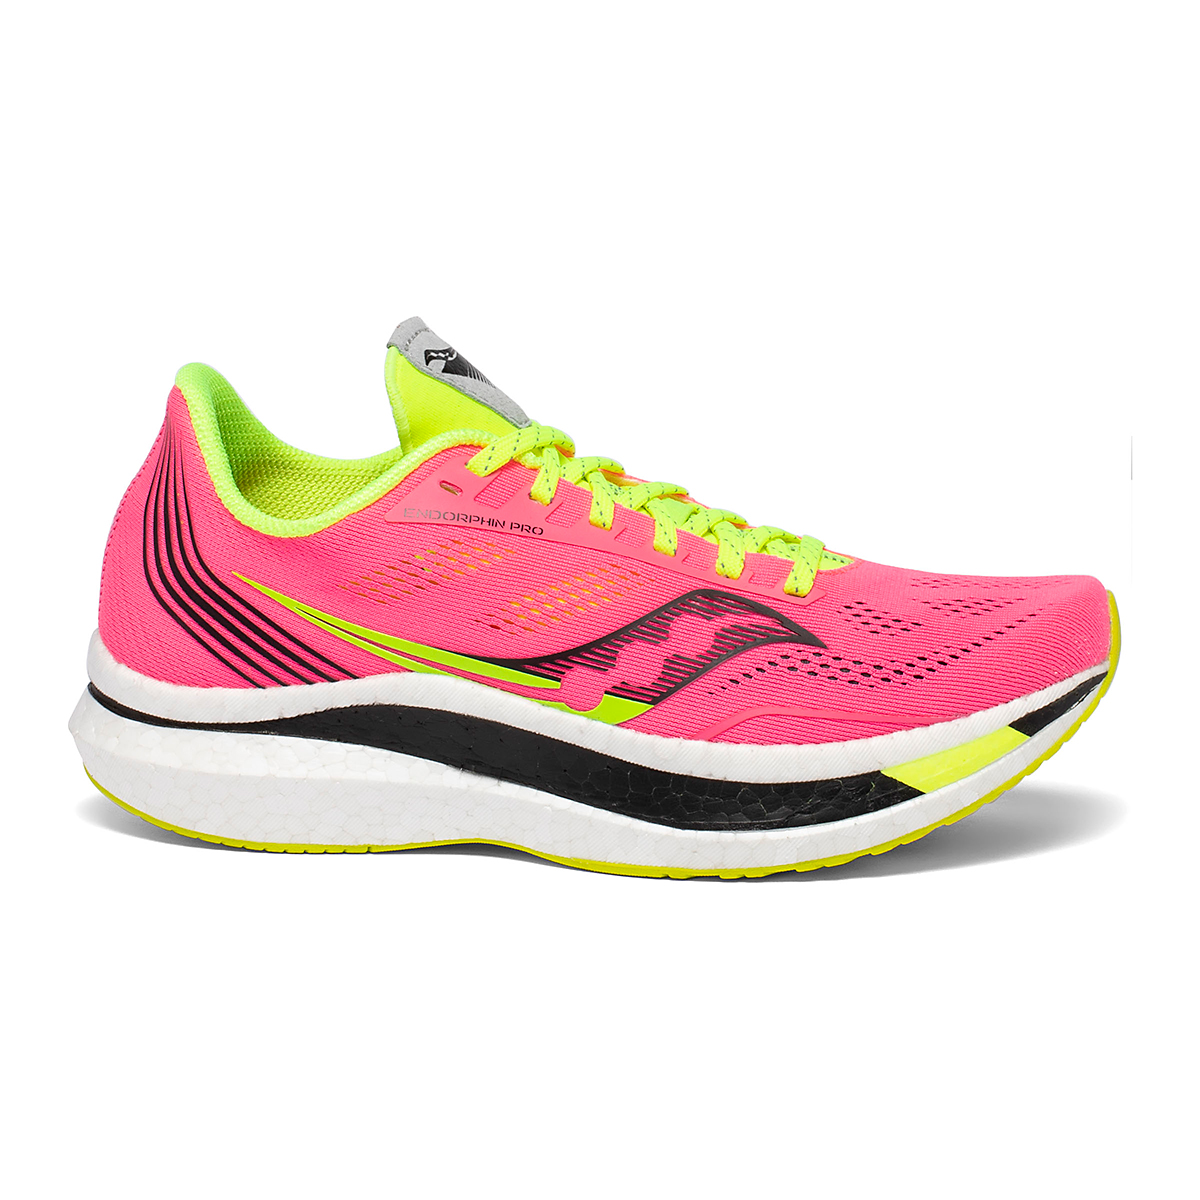 Women's Saucony VIZIPRO Speed Endorphin Pro Running Shoe - Color: Vizi Pink - Size: 5 - Width: Regular, Vizi Pink, large, image 1